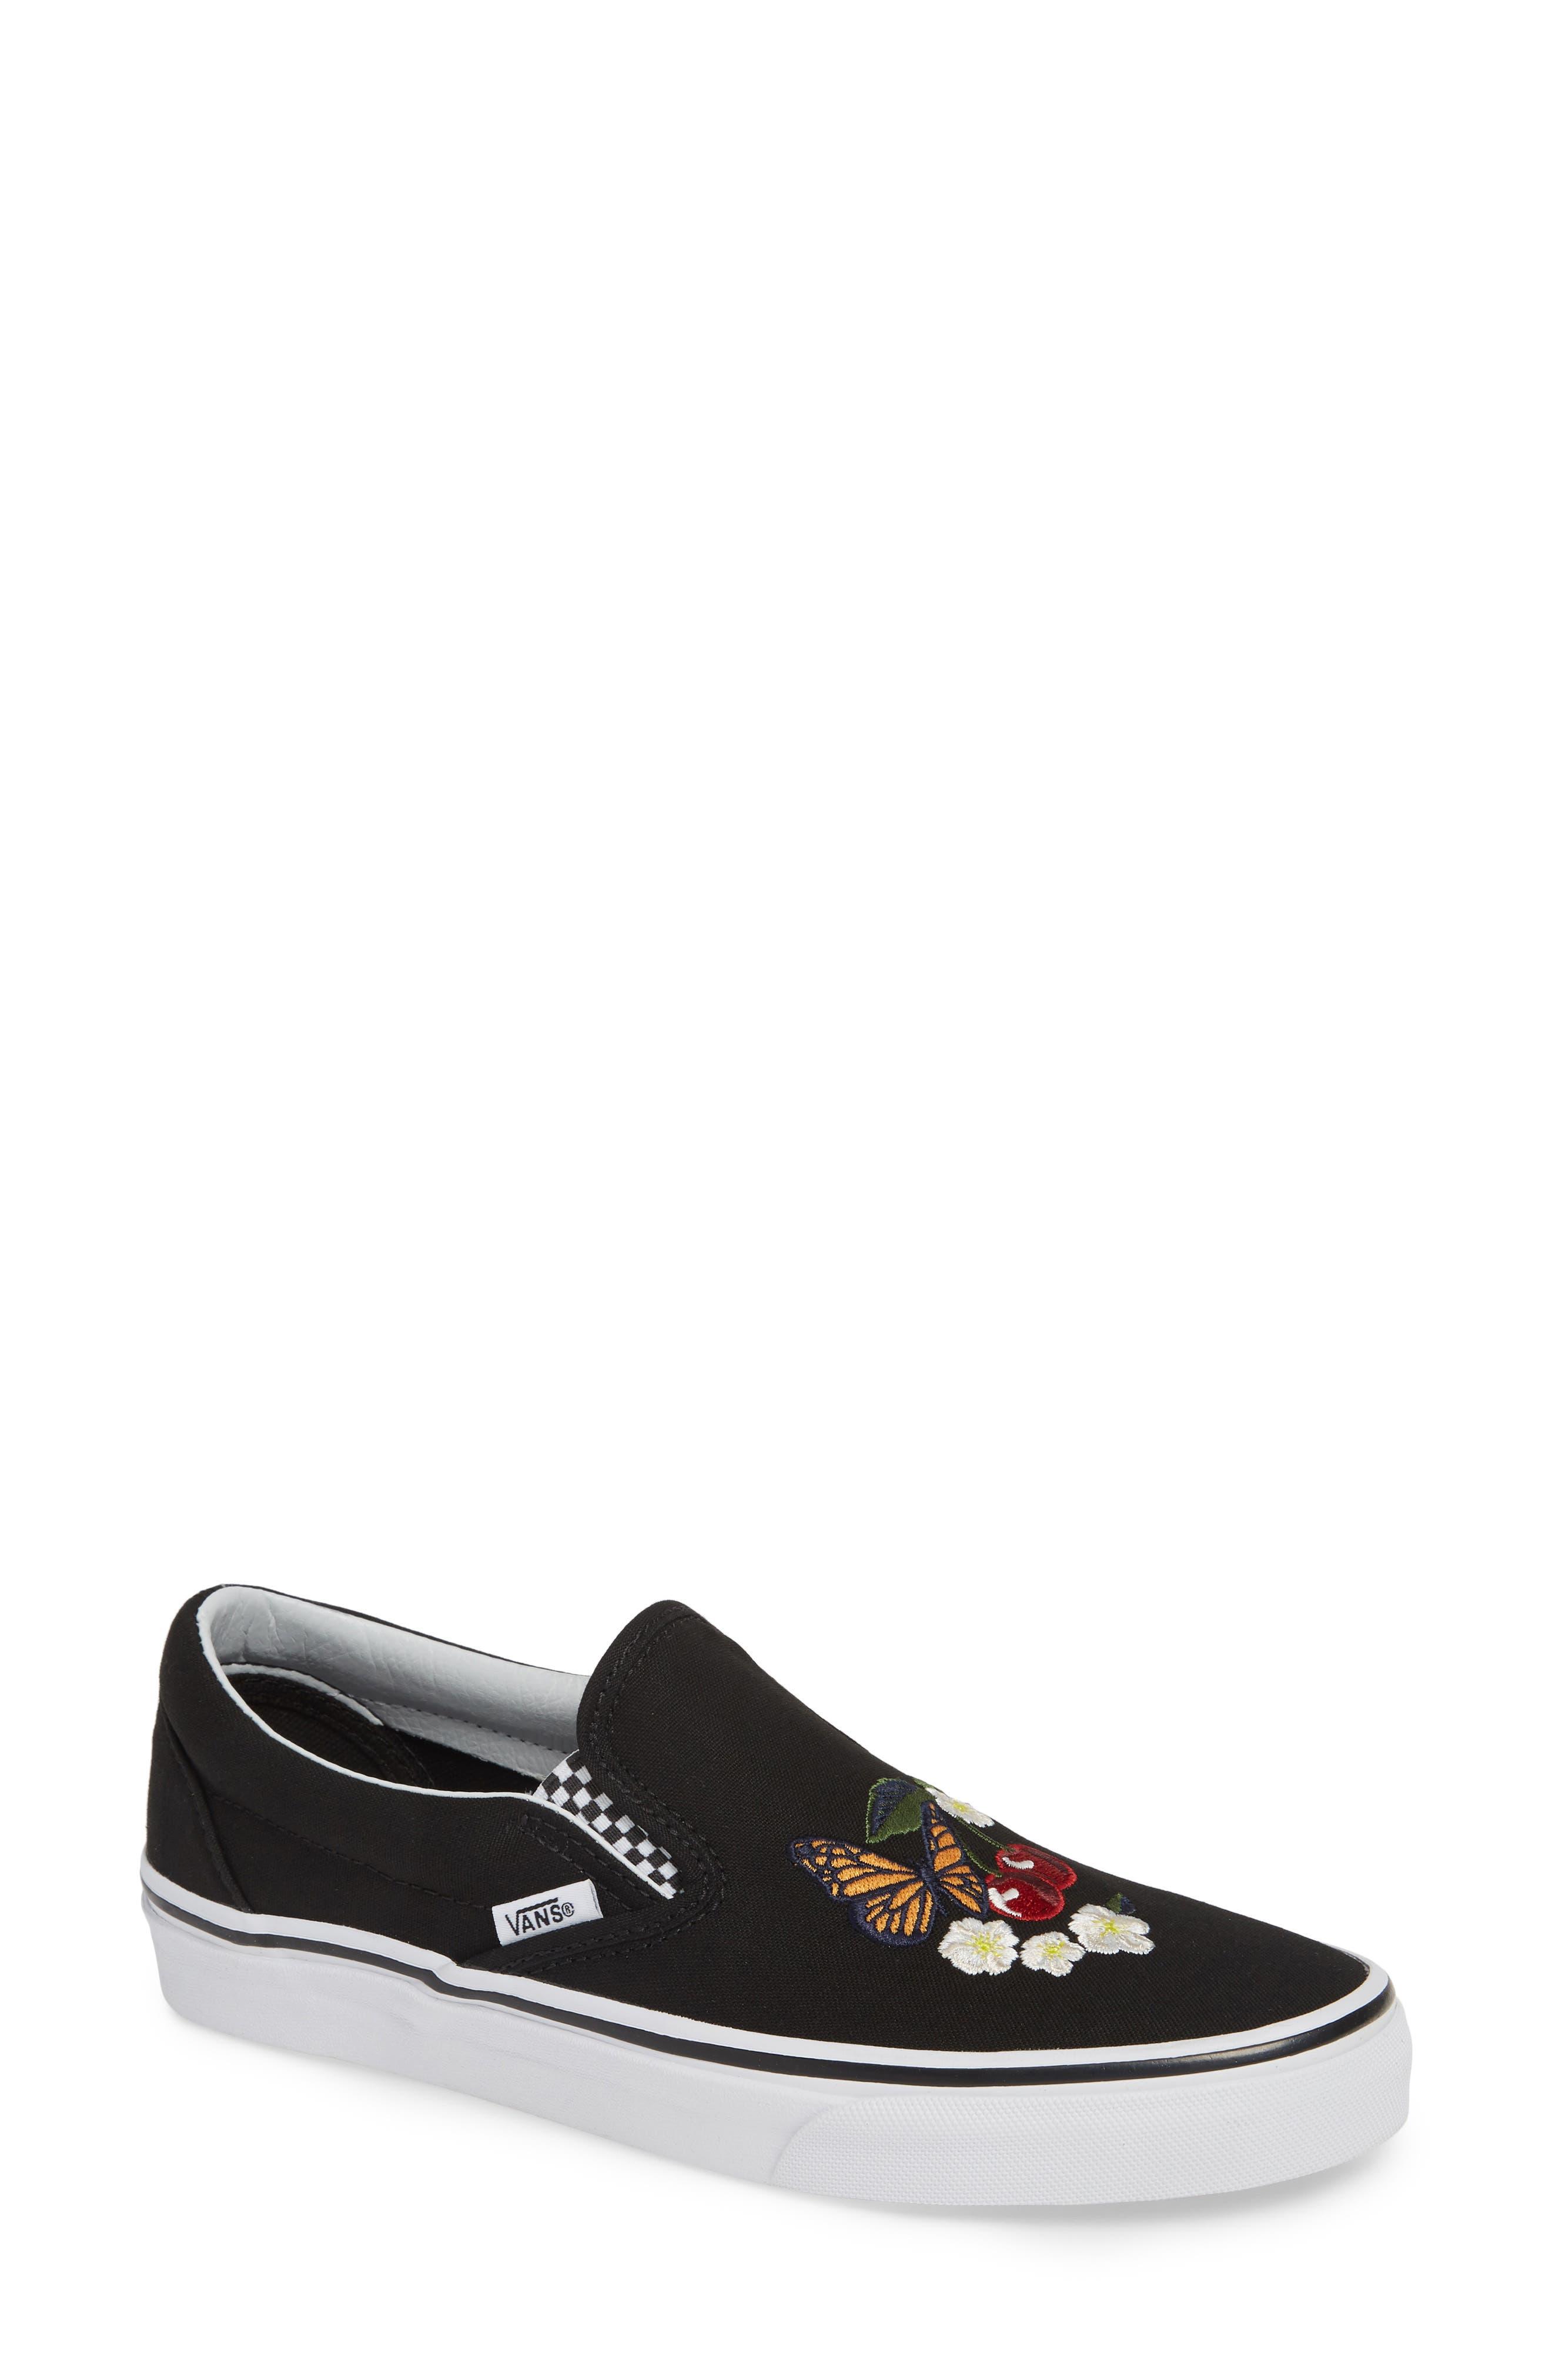 Classic Slip-On Sneaker, Main, color, CHECKER FLORAL BLACK